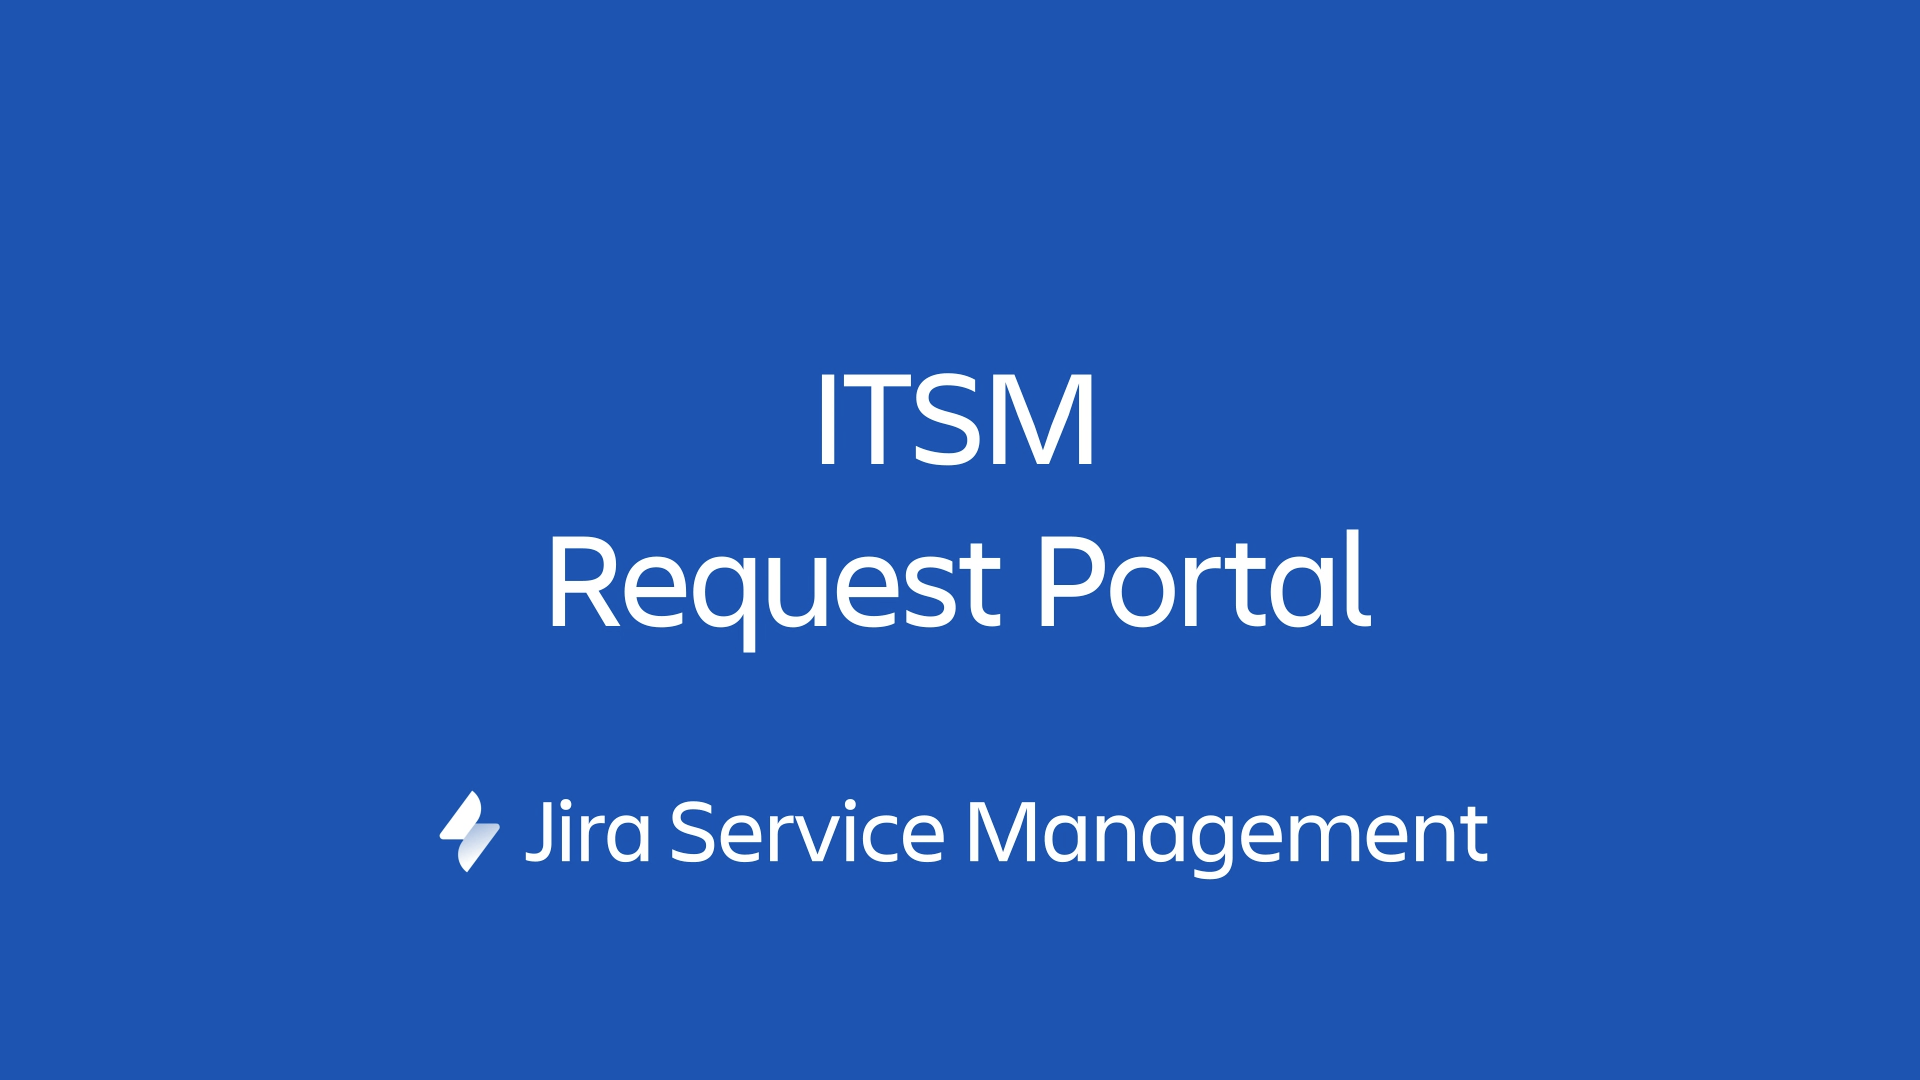 ITSM-Anfrageportal in Jira Service Management